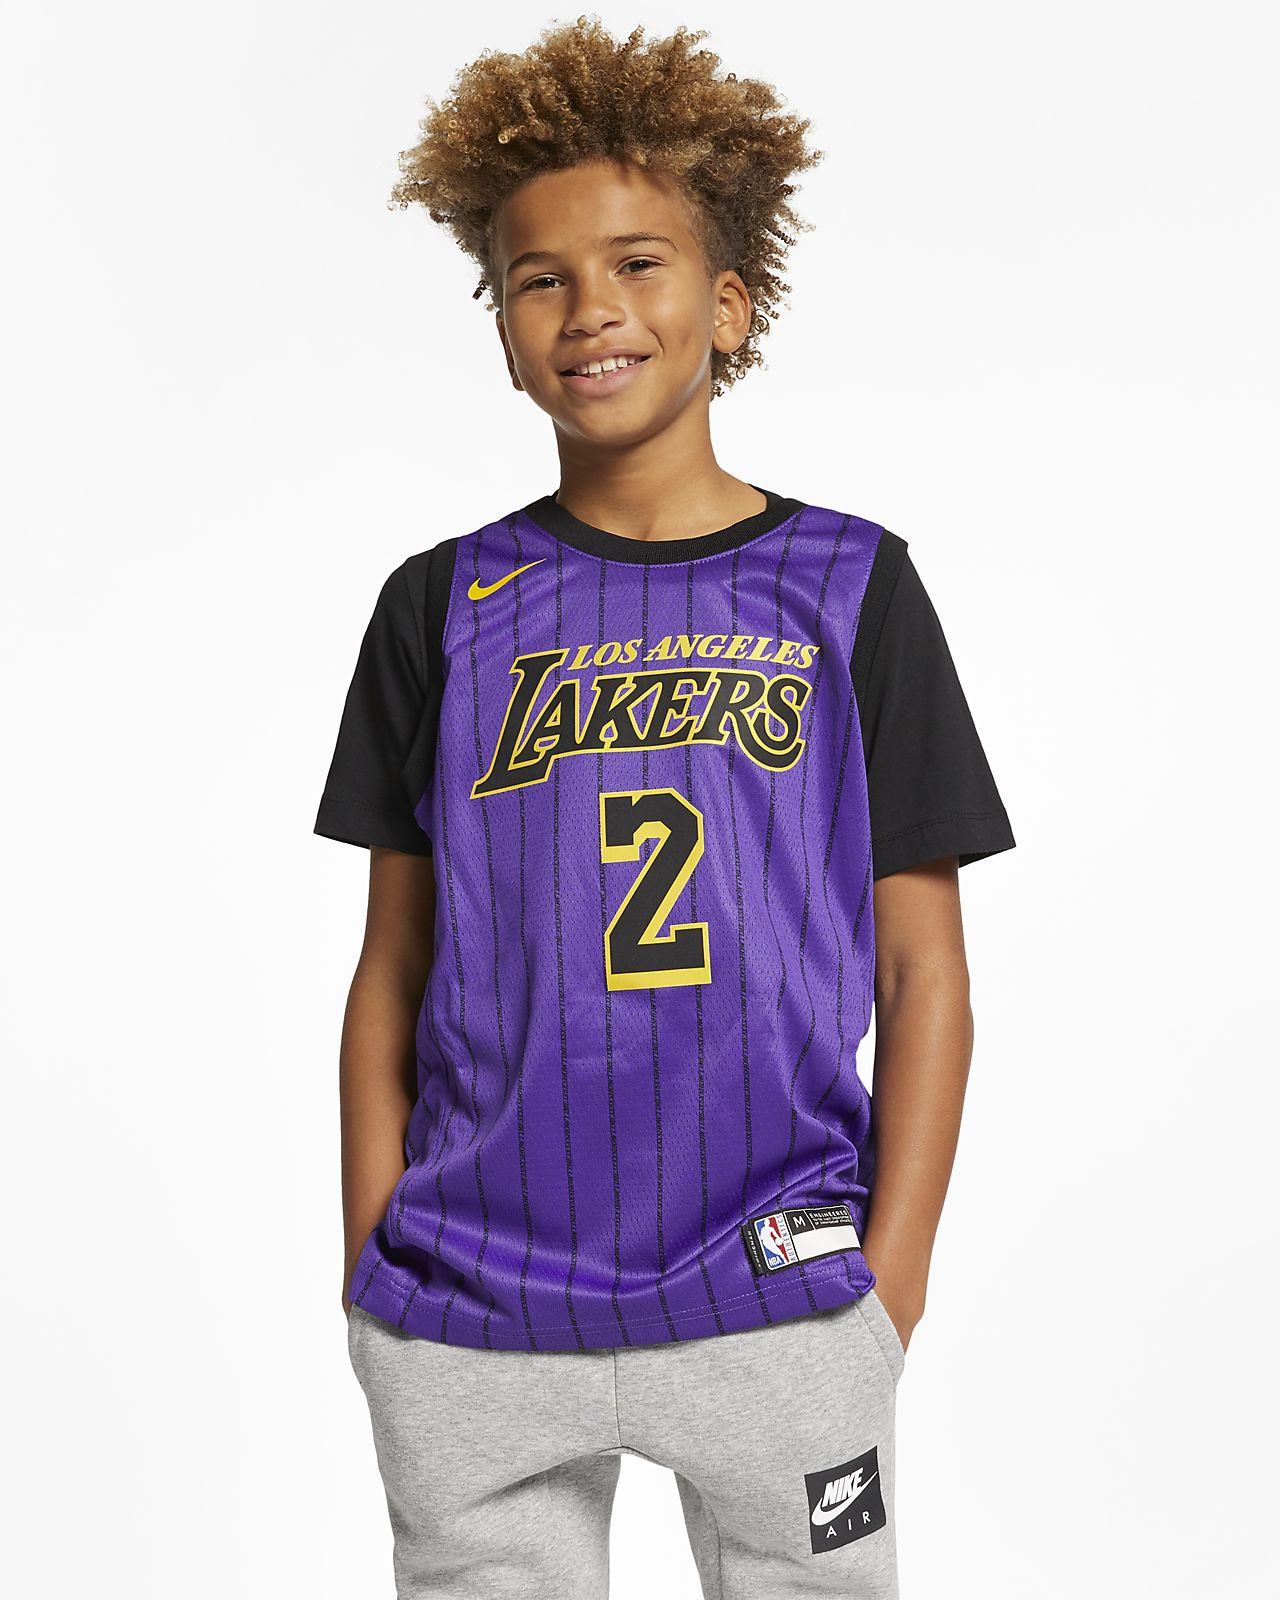 192a5903af1b Los Angeles Lakers City Edition Swingman Big Kids  Nike NBA Jersey ...